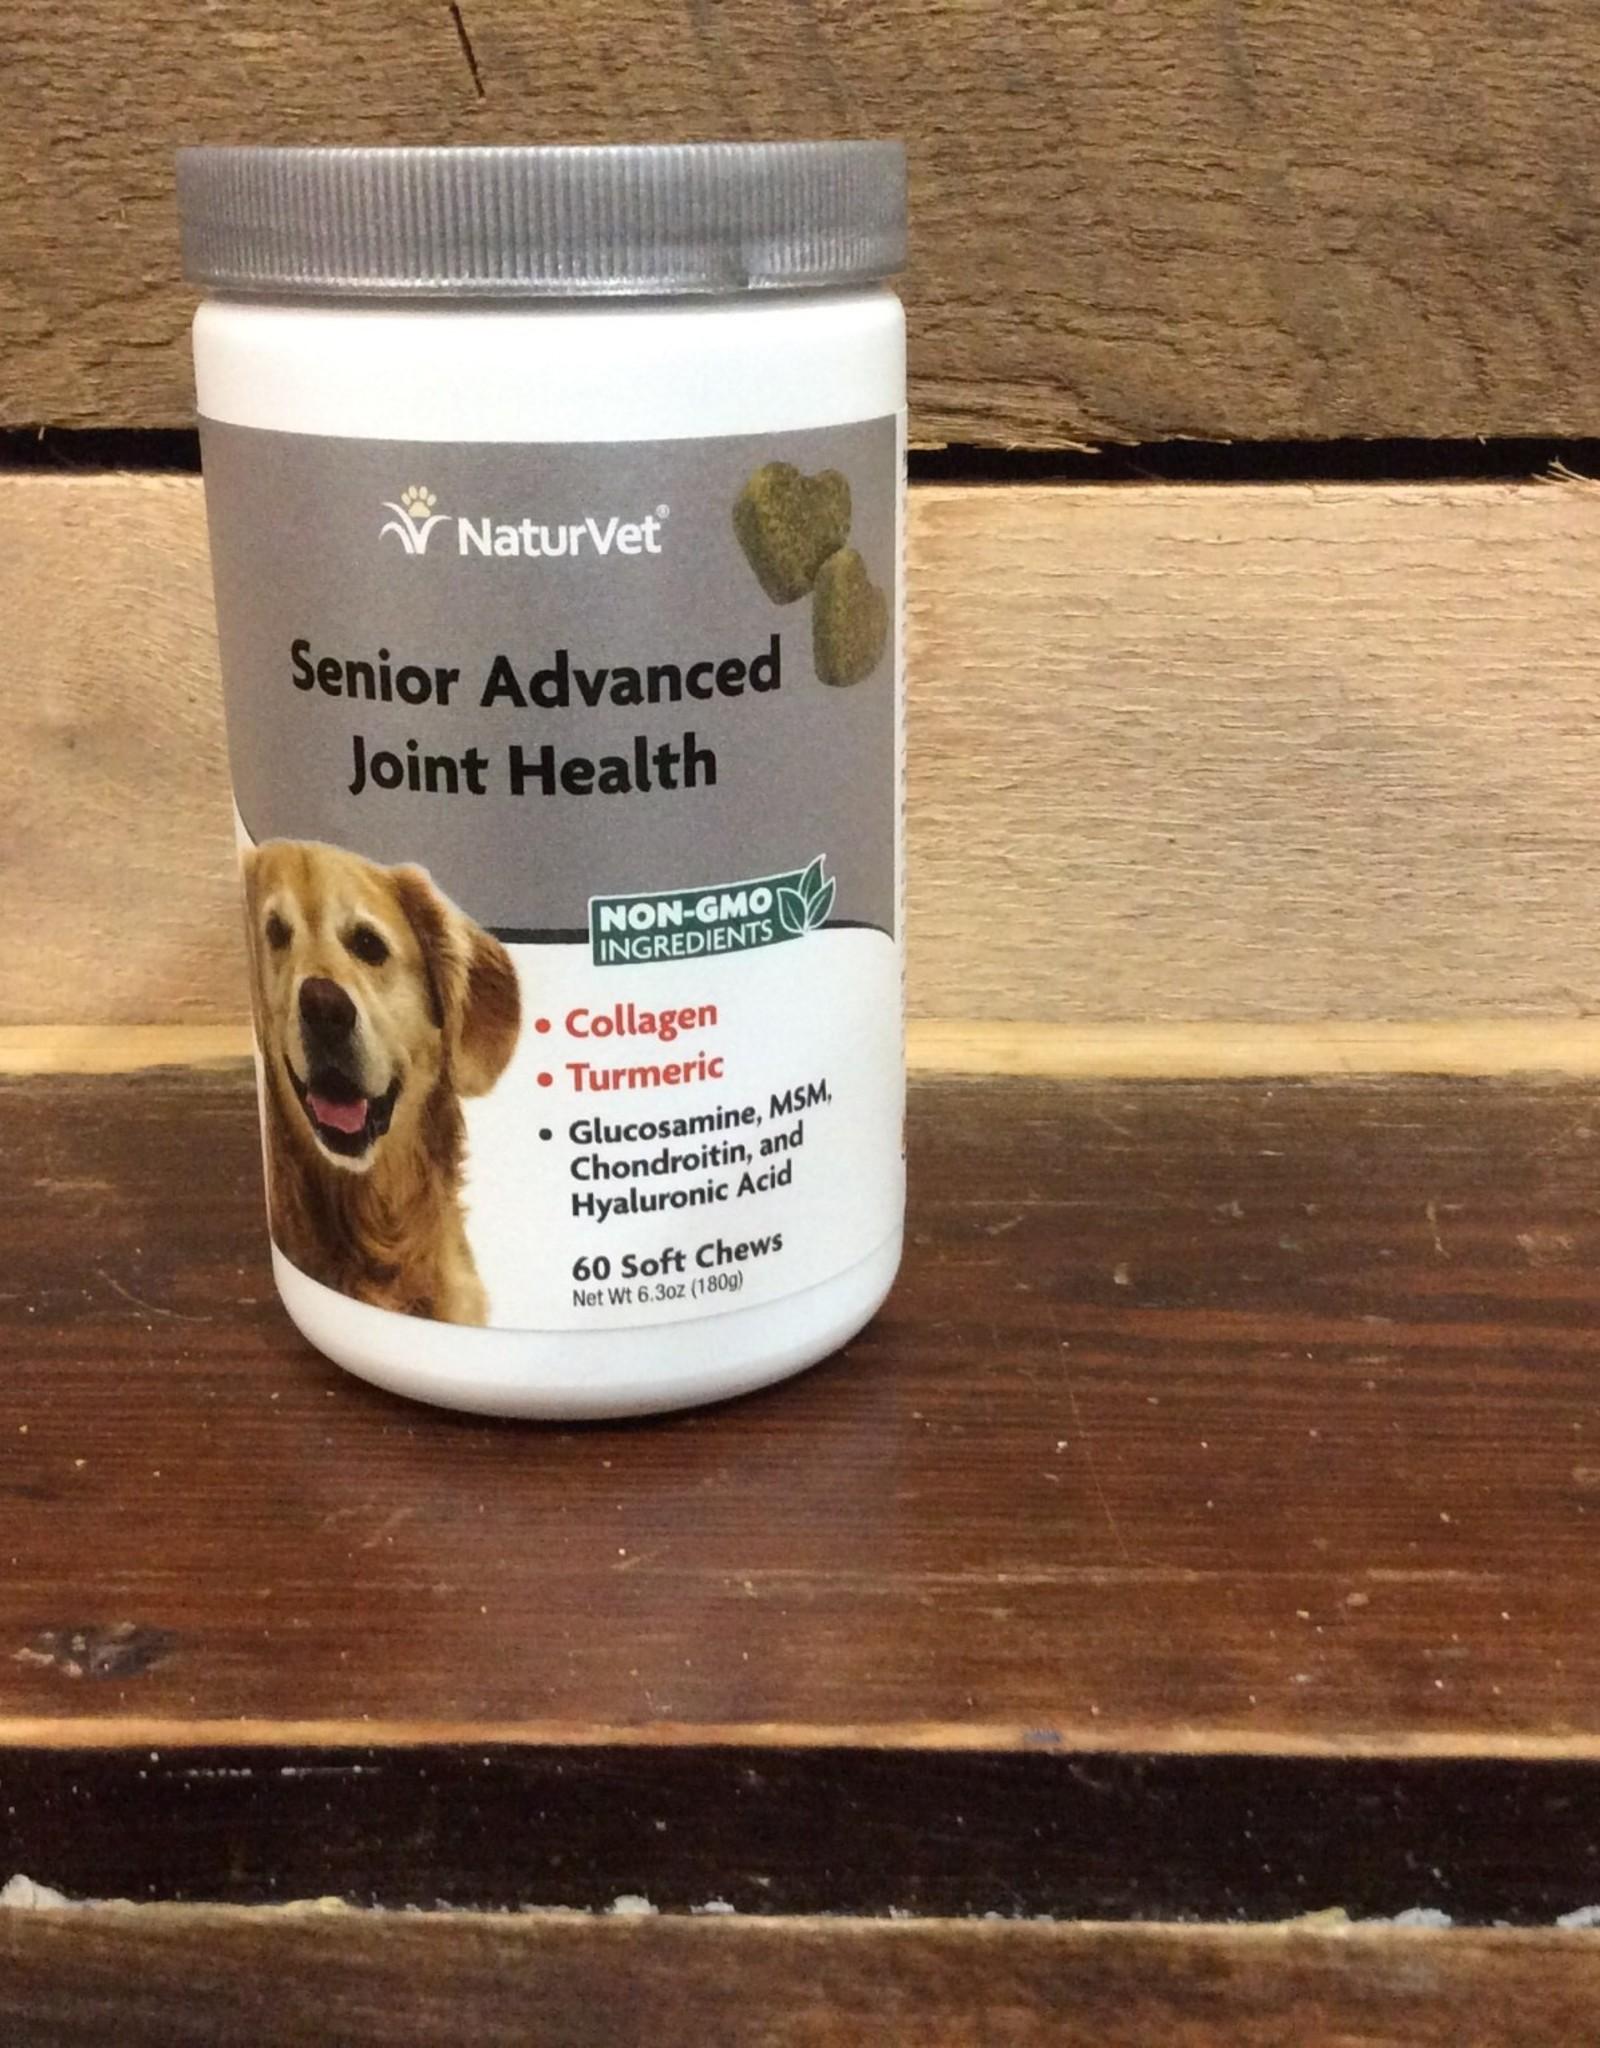 NaturVet Senior Advanced Joint Health 60ct.